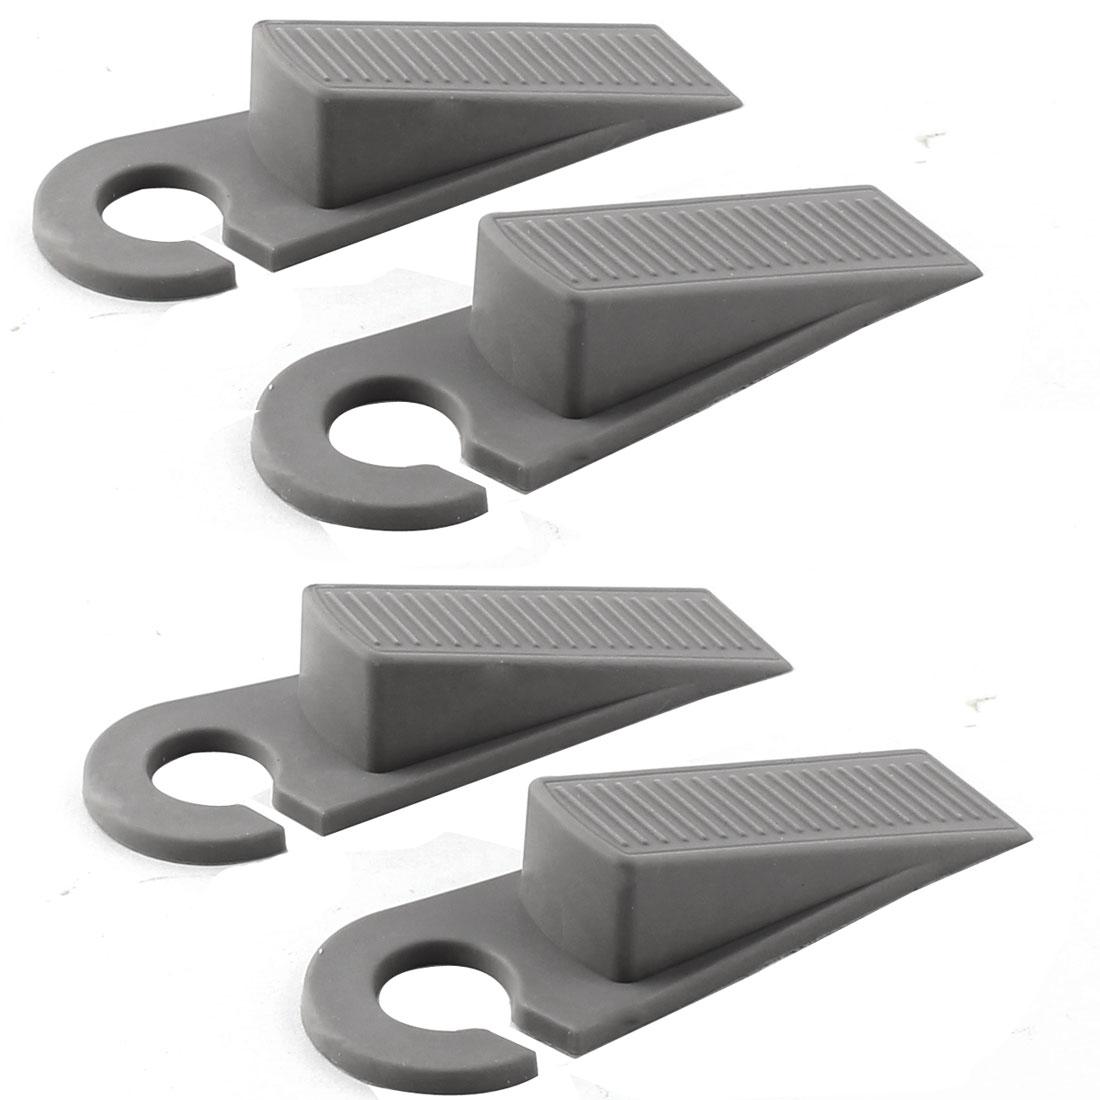 Home Office Floor Rubber Anti-slip Door Stopper Guard Protector Gray 2 Pairs